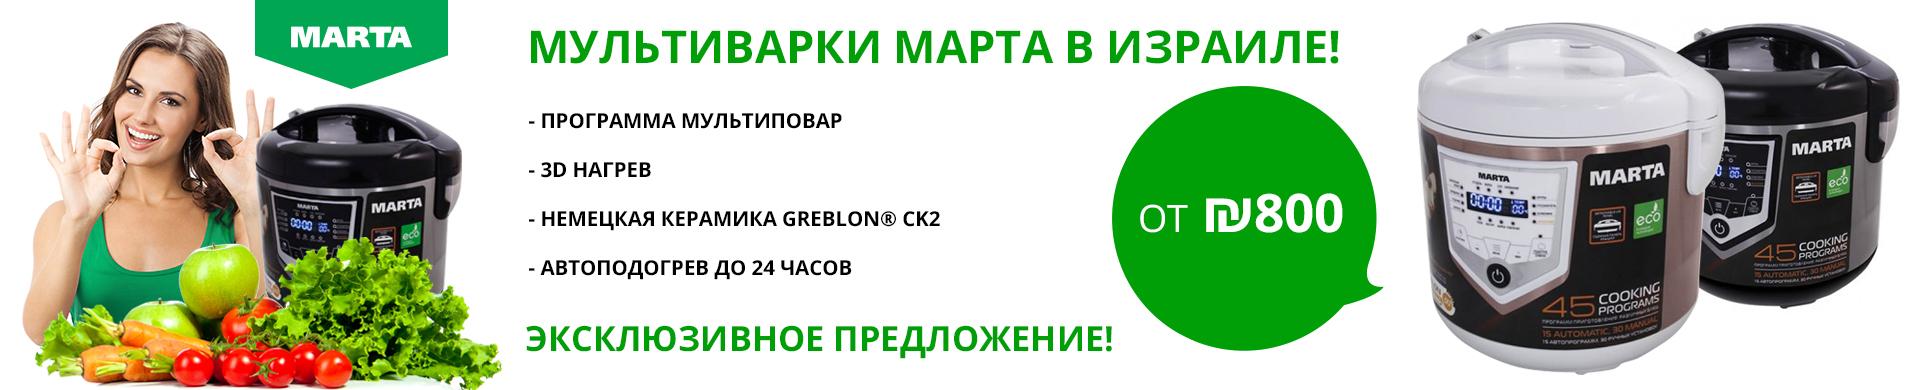 marta_ru_03